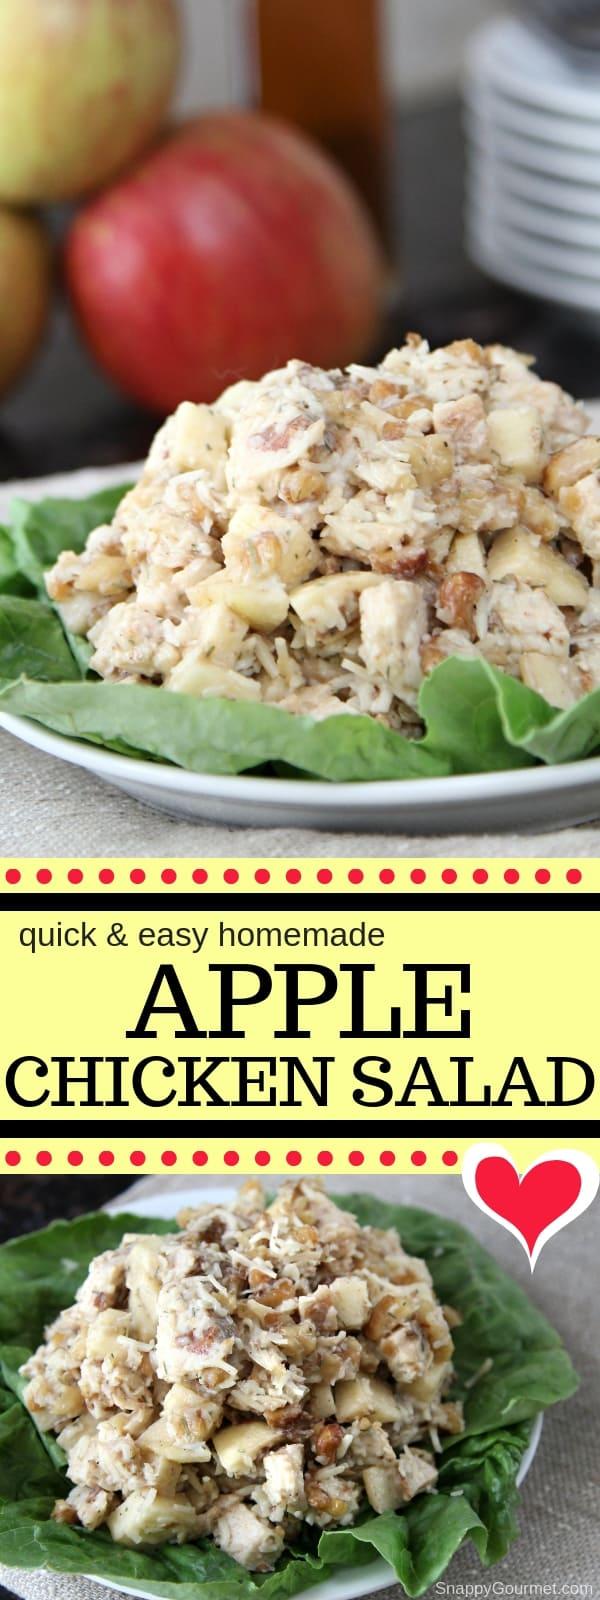 apple chicken salad on plate collage